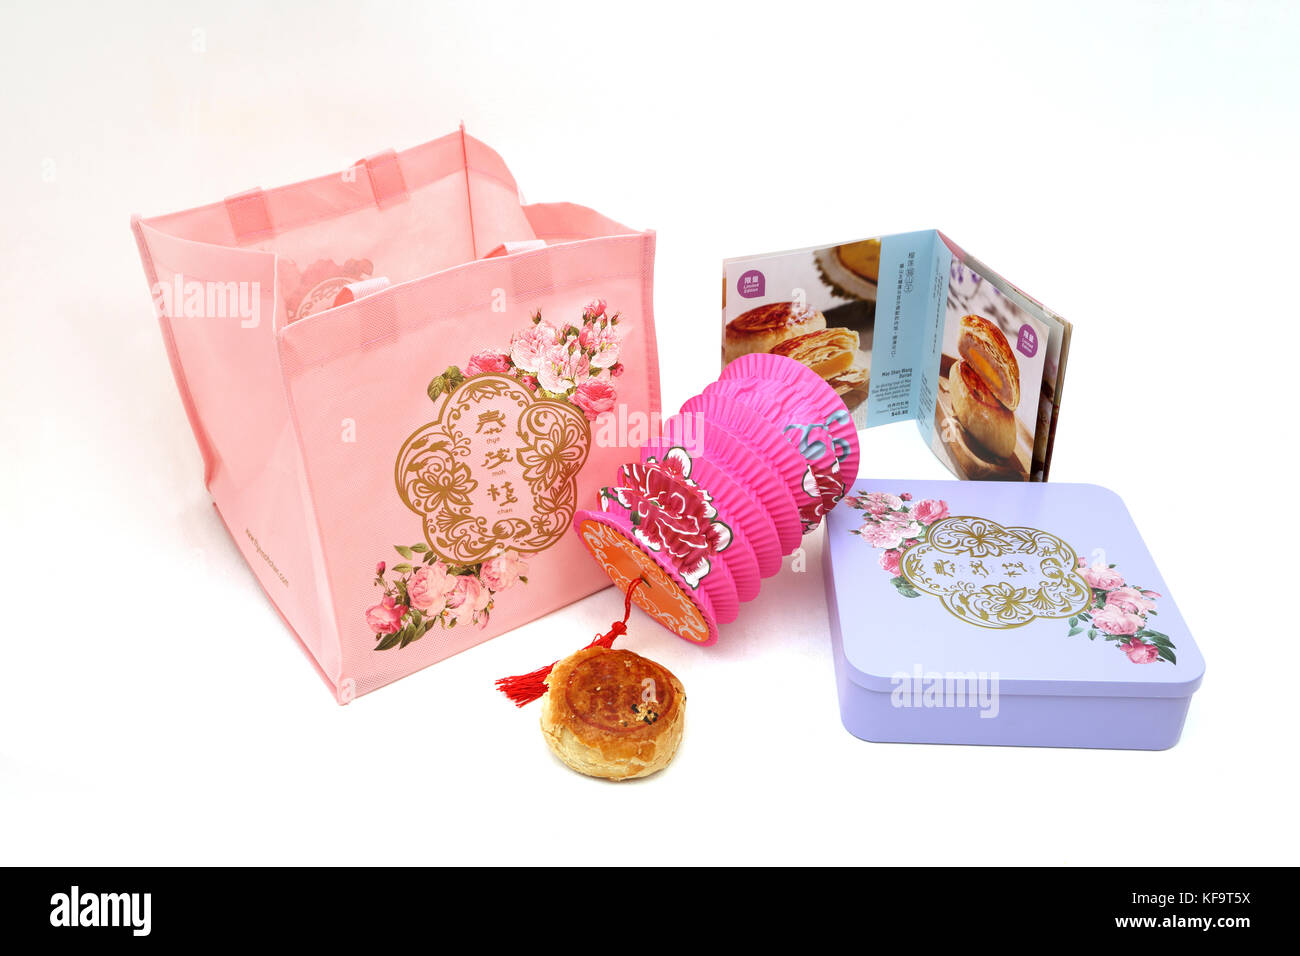 Mooncake Teochew Gift Set - Yuan Yang con yema de huevo ,de estaño Mooncakes, Thye Moh Chan Tote Bag, folleto y linterna china Foto de stock